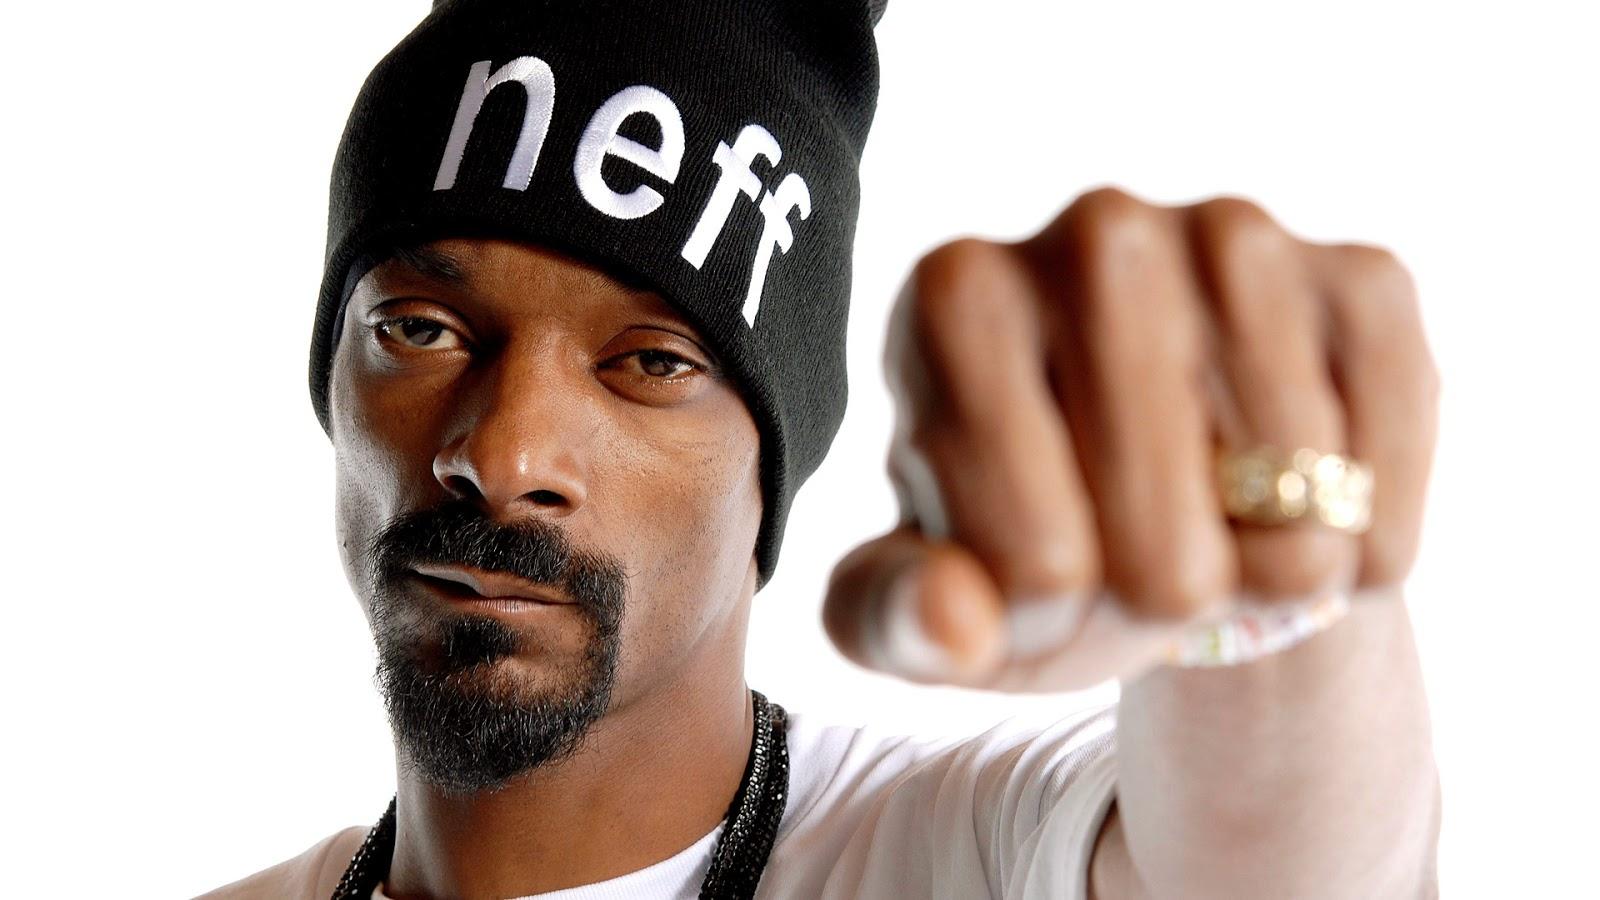 Daftar 10 Lagu Terbaik Snoop Dogg